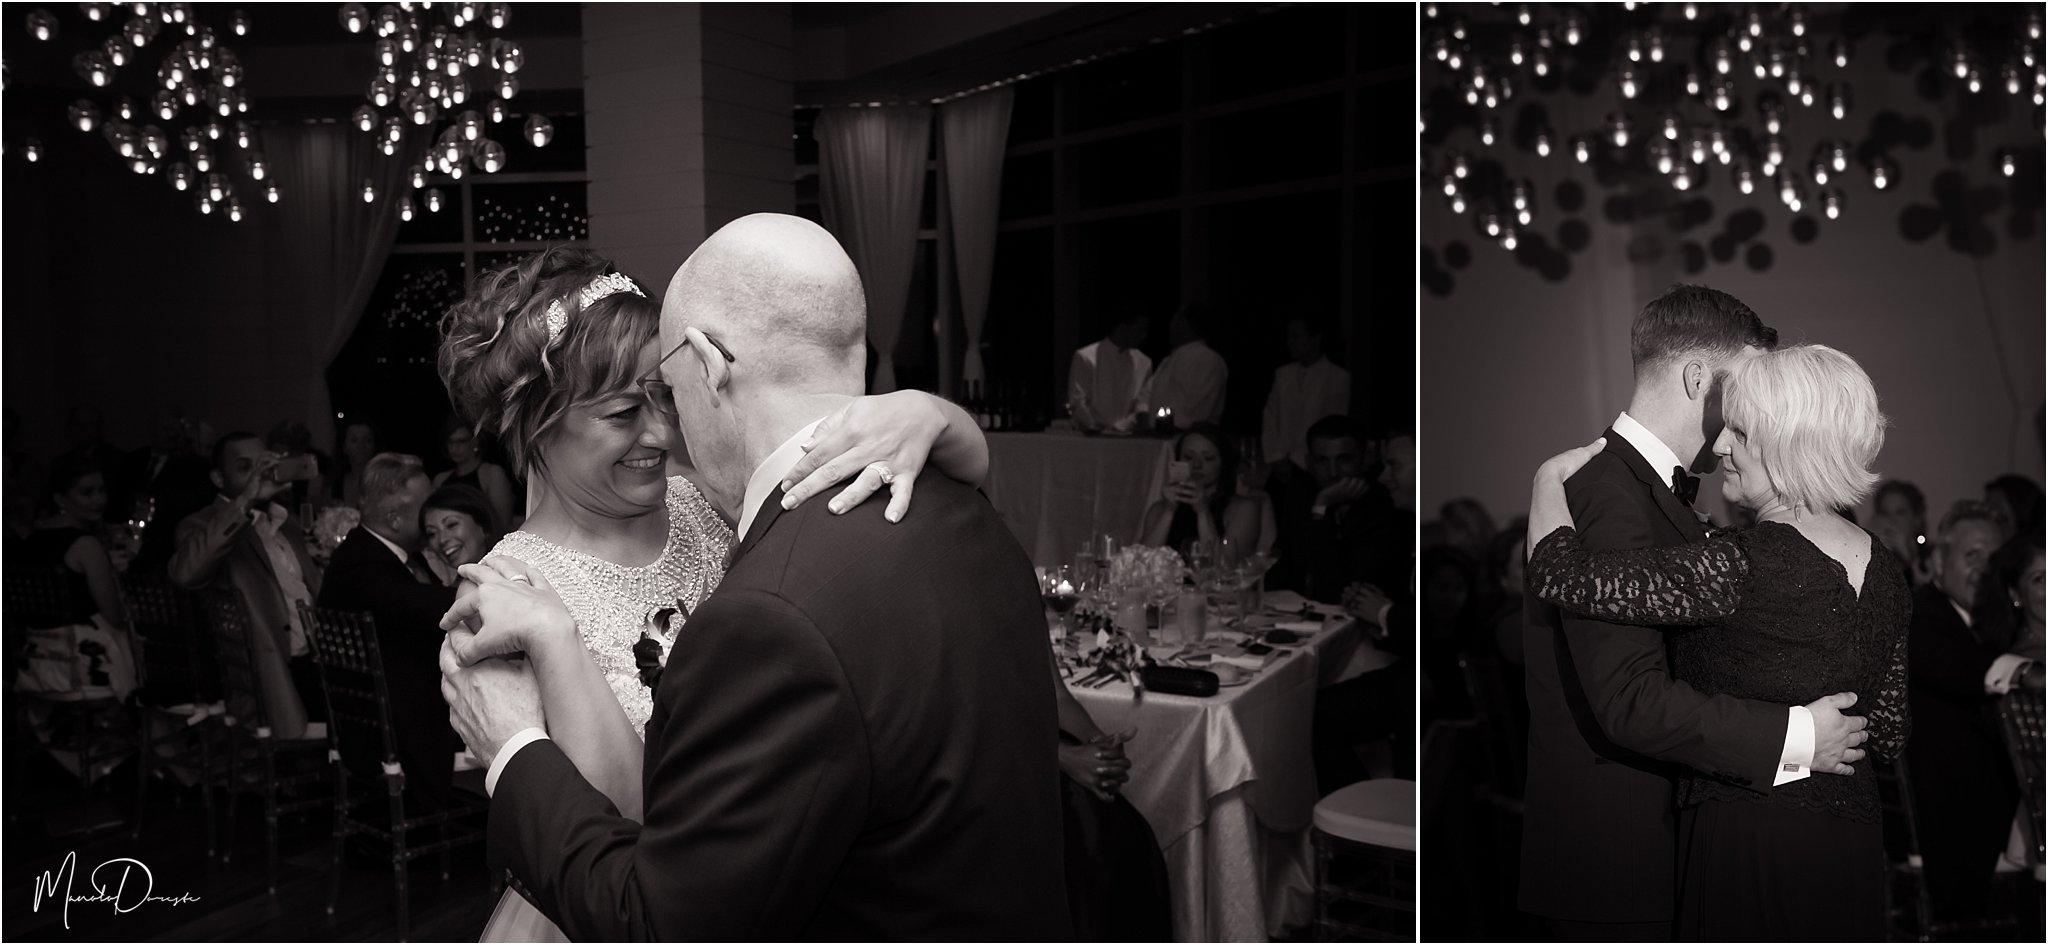 0458_ManoloDoreste_InFocusStudios_Wedding_Family_Photography_Miami_MiamiPhotographer.jpg